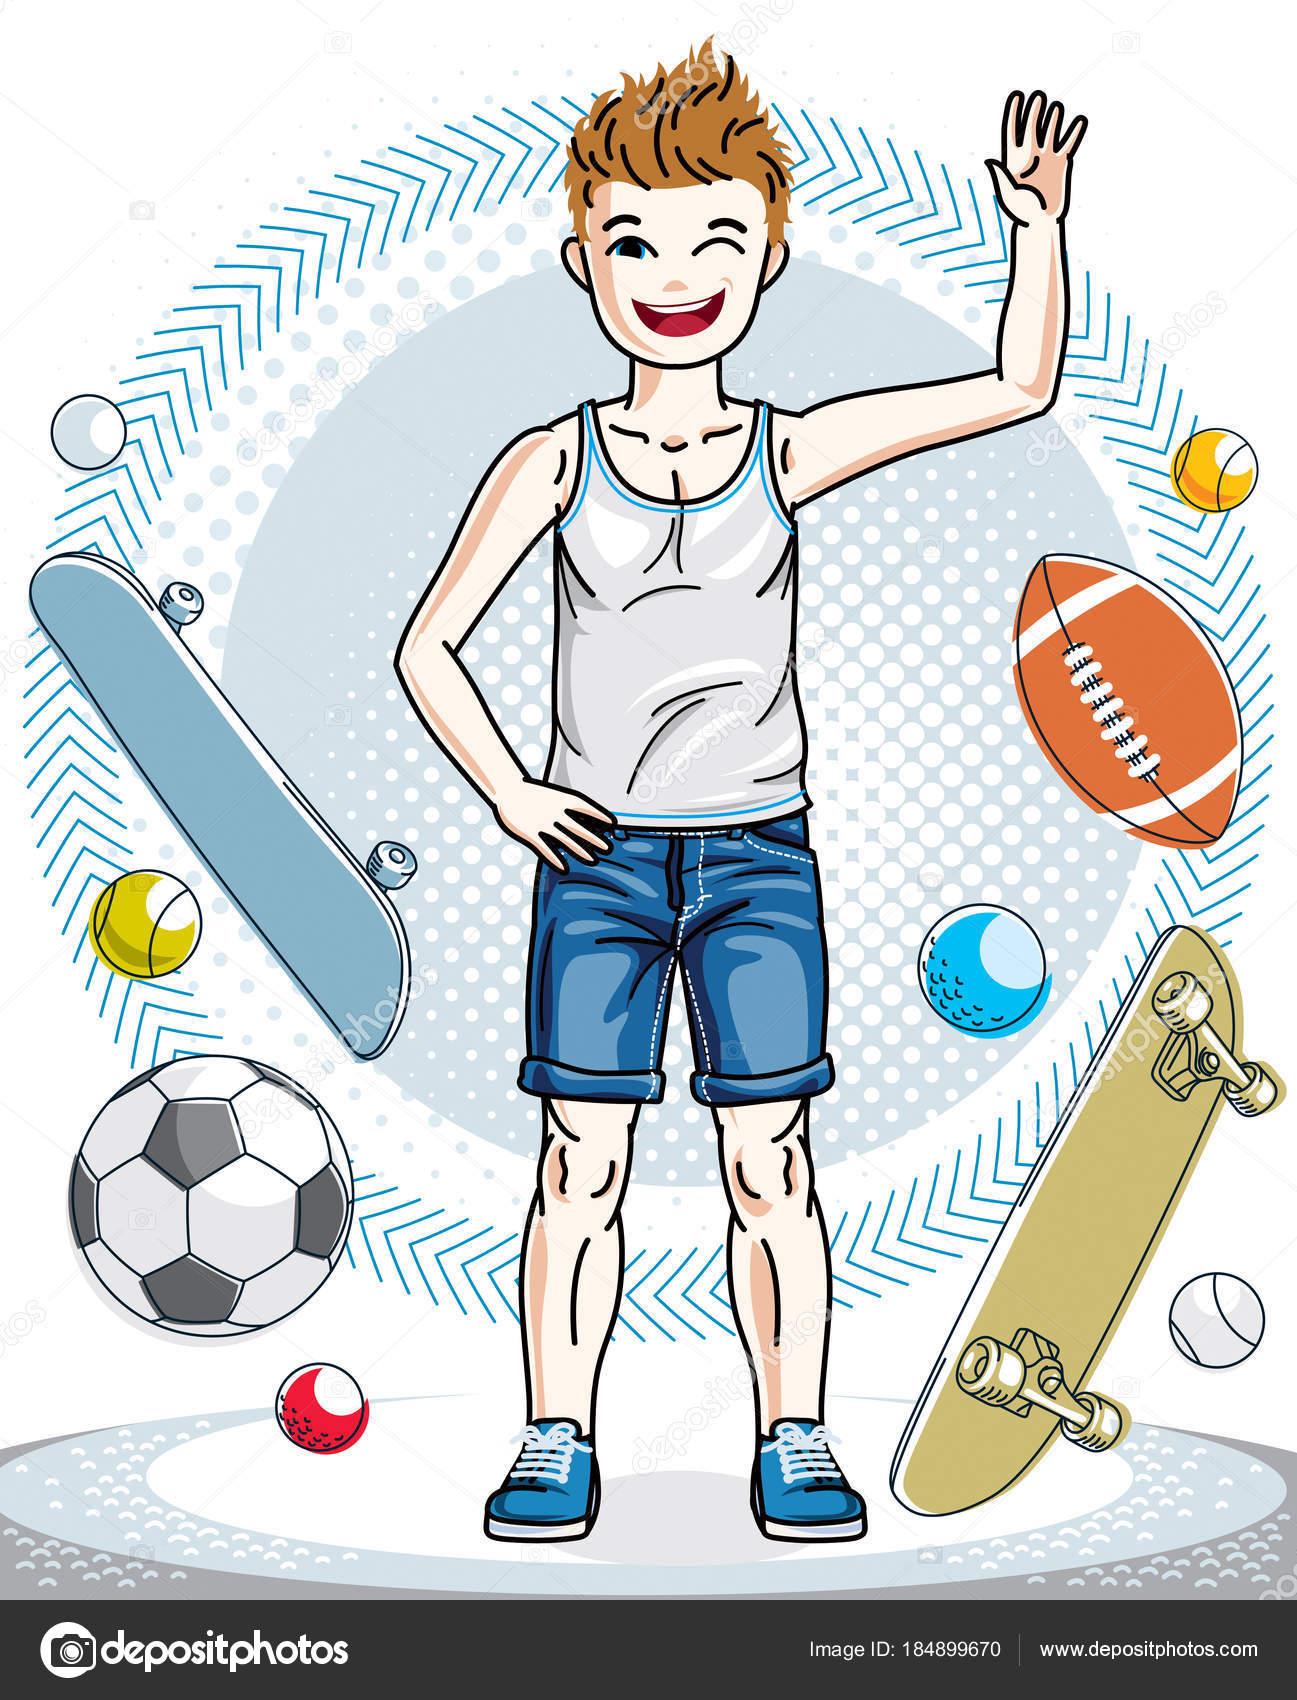 96a2cee8340 Όμορφο μικρό αγόρι χαριτωμένο παιδί στέκεται φορώντας μοντέρνο casual ρούχα.  Πολύ ωραίο άνθρωπο εικονογράφηση φορέα. Παιδική ηλικία lifestyle εικόνες  clip ...